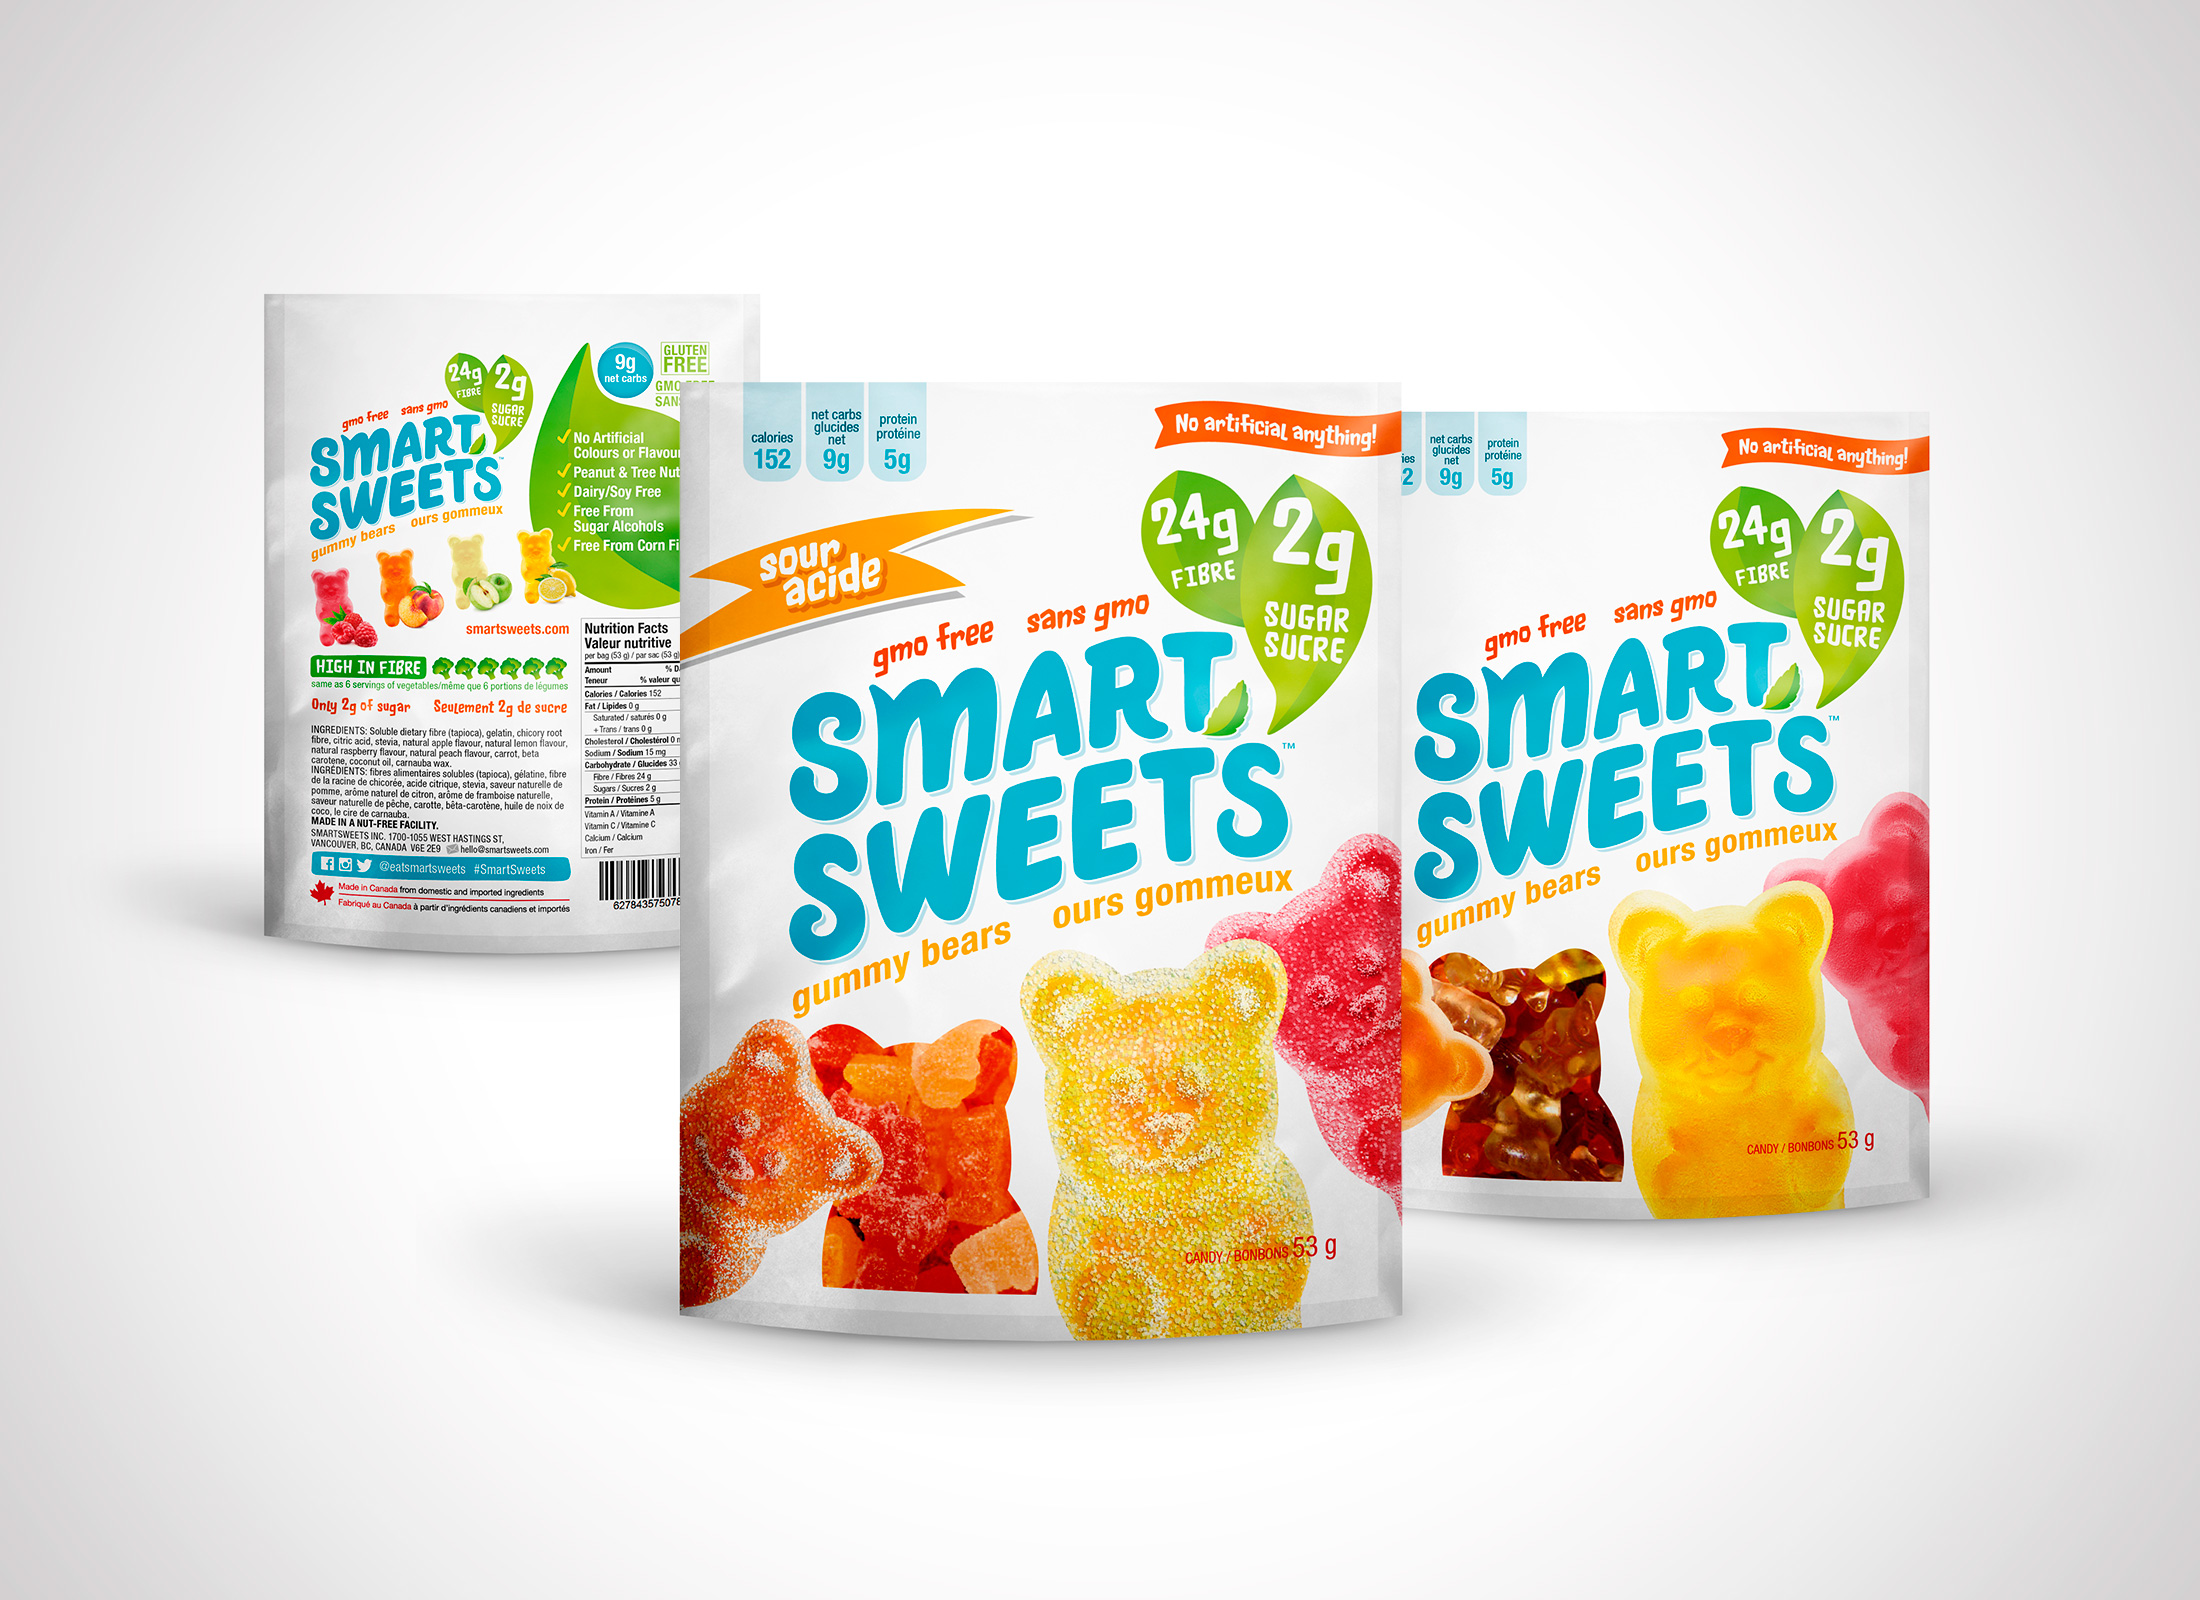 Dana Lu smartsweets gummy bears candy packaging